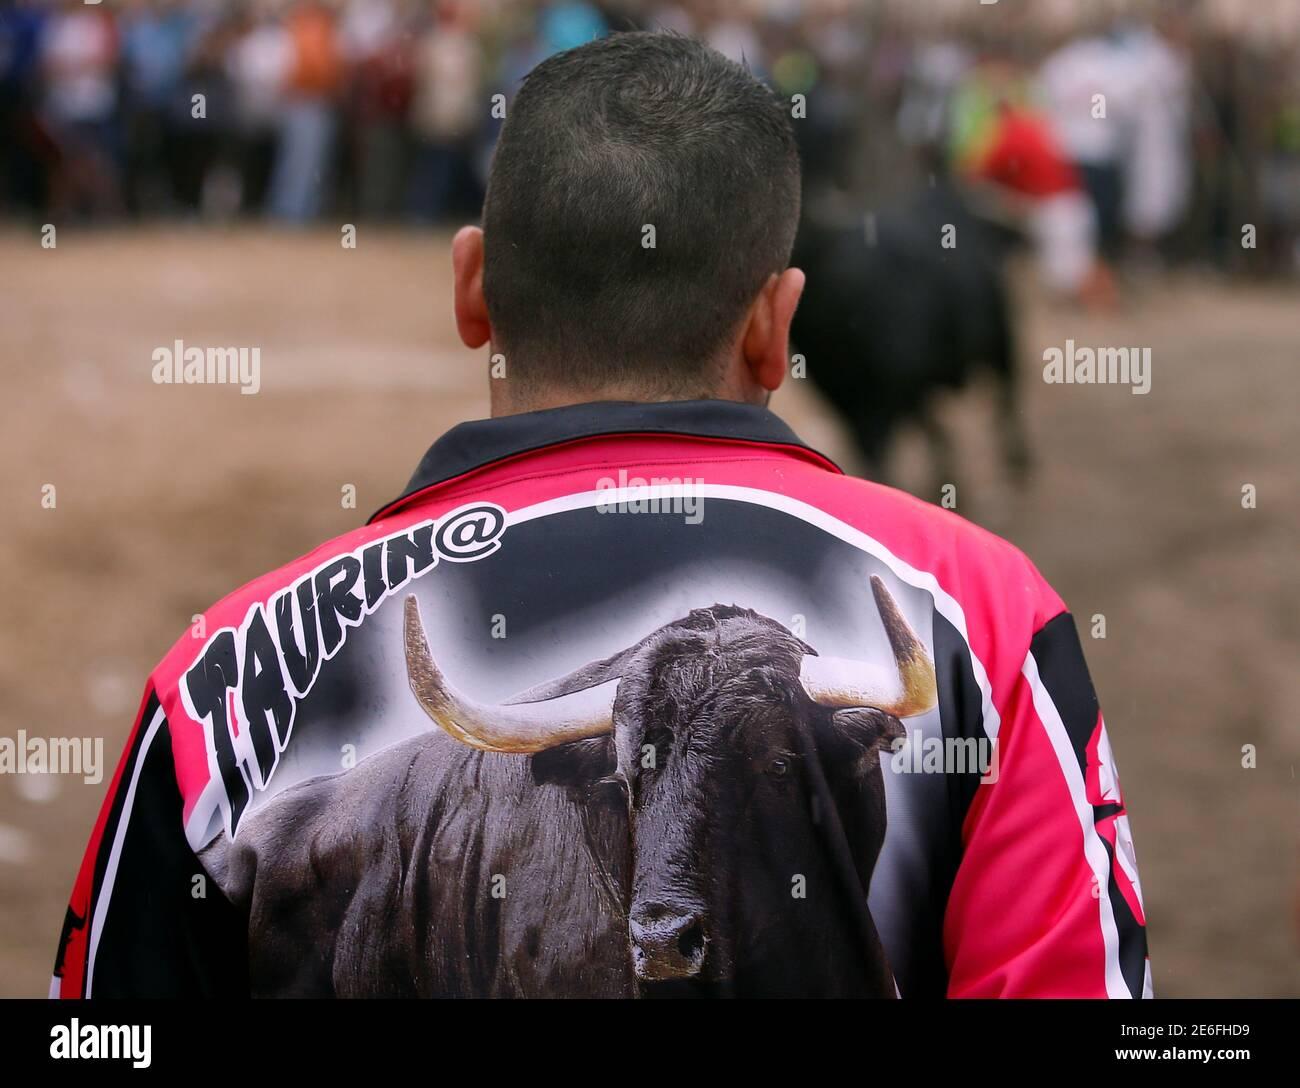 Sergio De La Peña High Resolution Stock Photography And Images Alamy